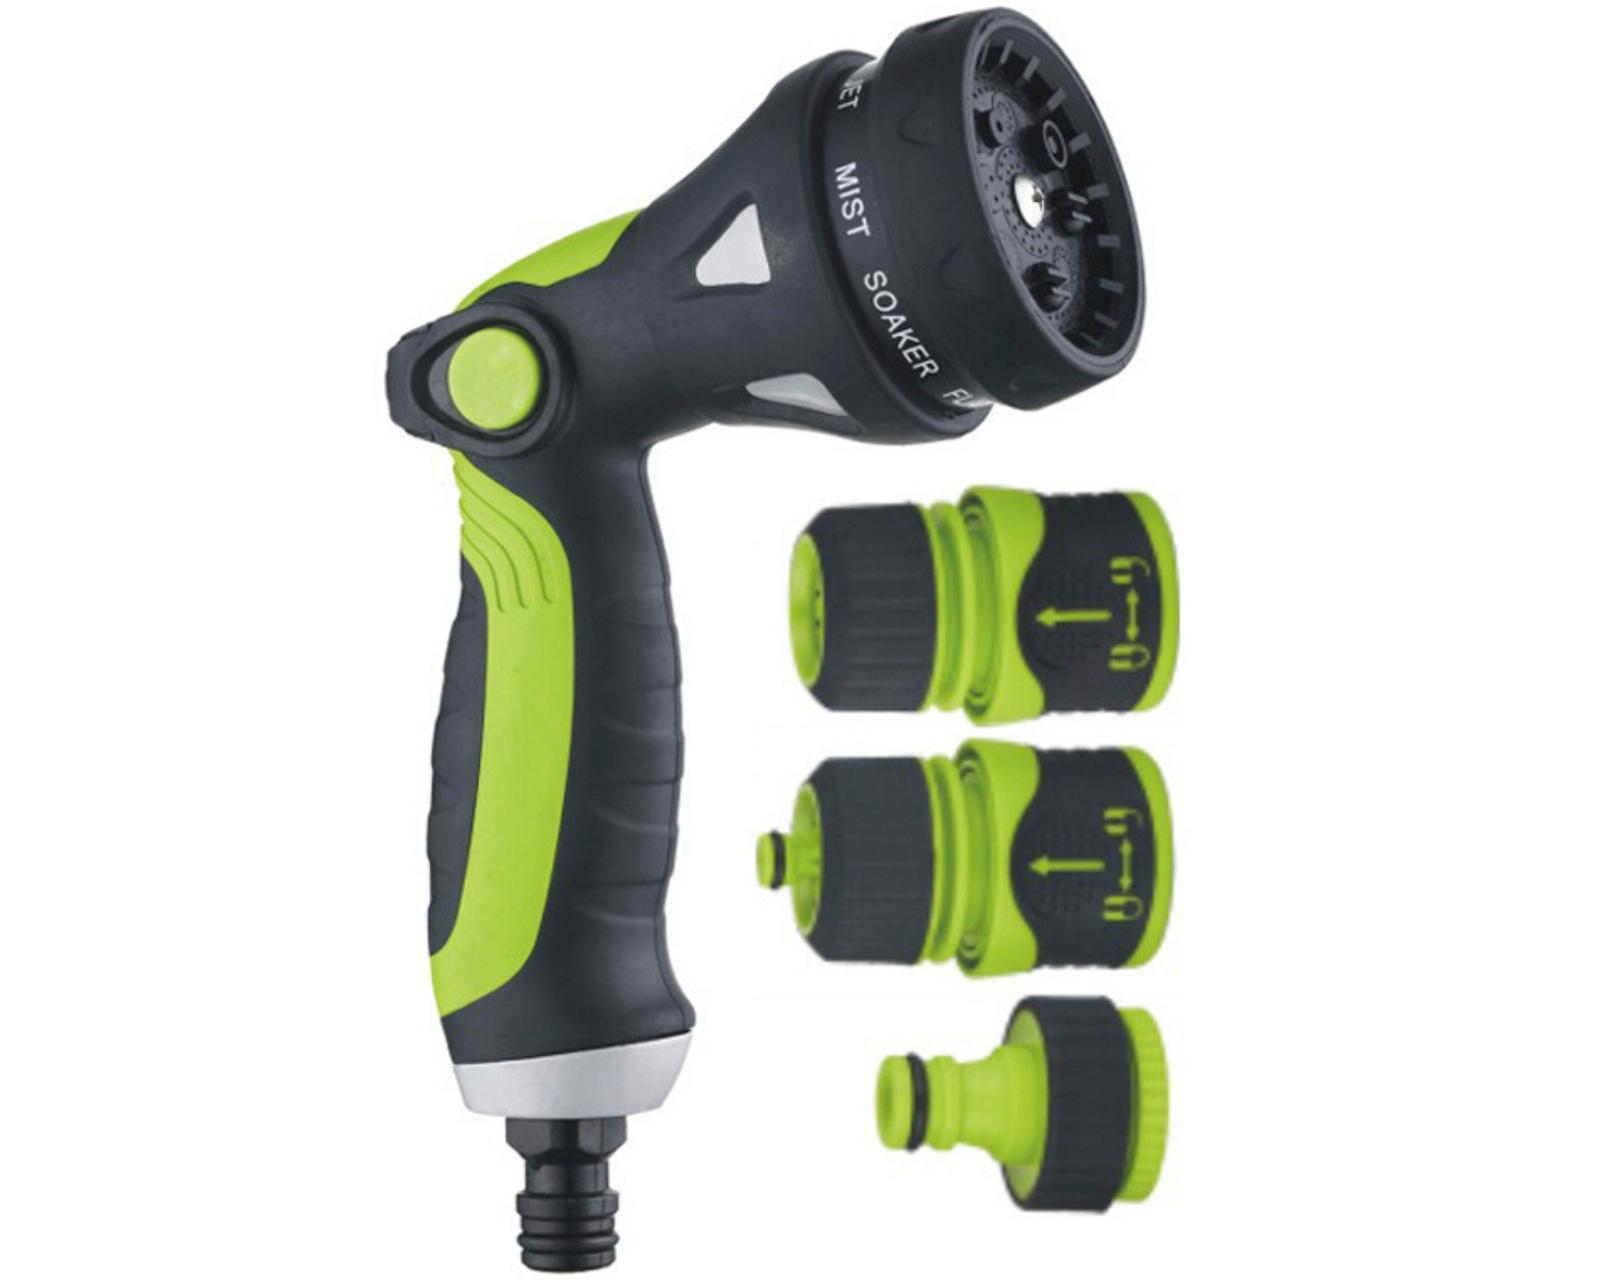 8 Way Garden Hose Spray Nozzle Set – Hosepipe Gun Tap Adapter Fitting Connector